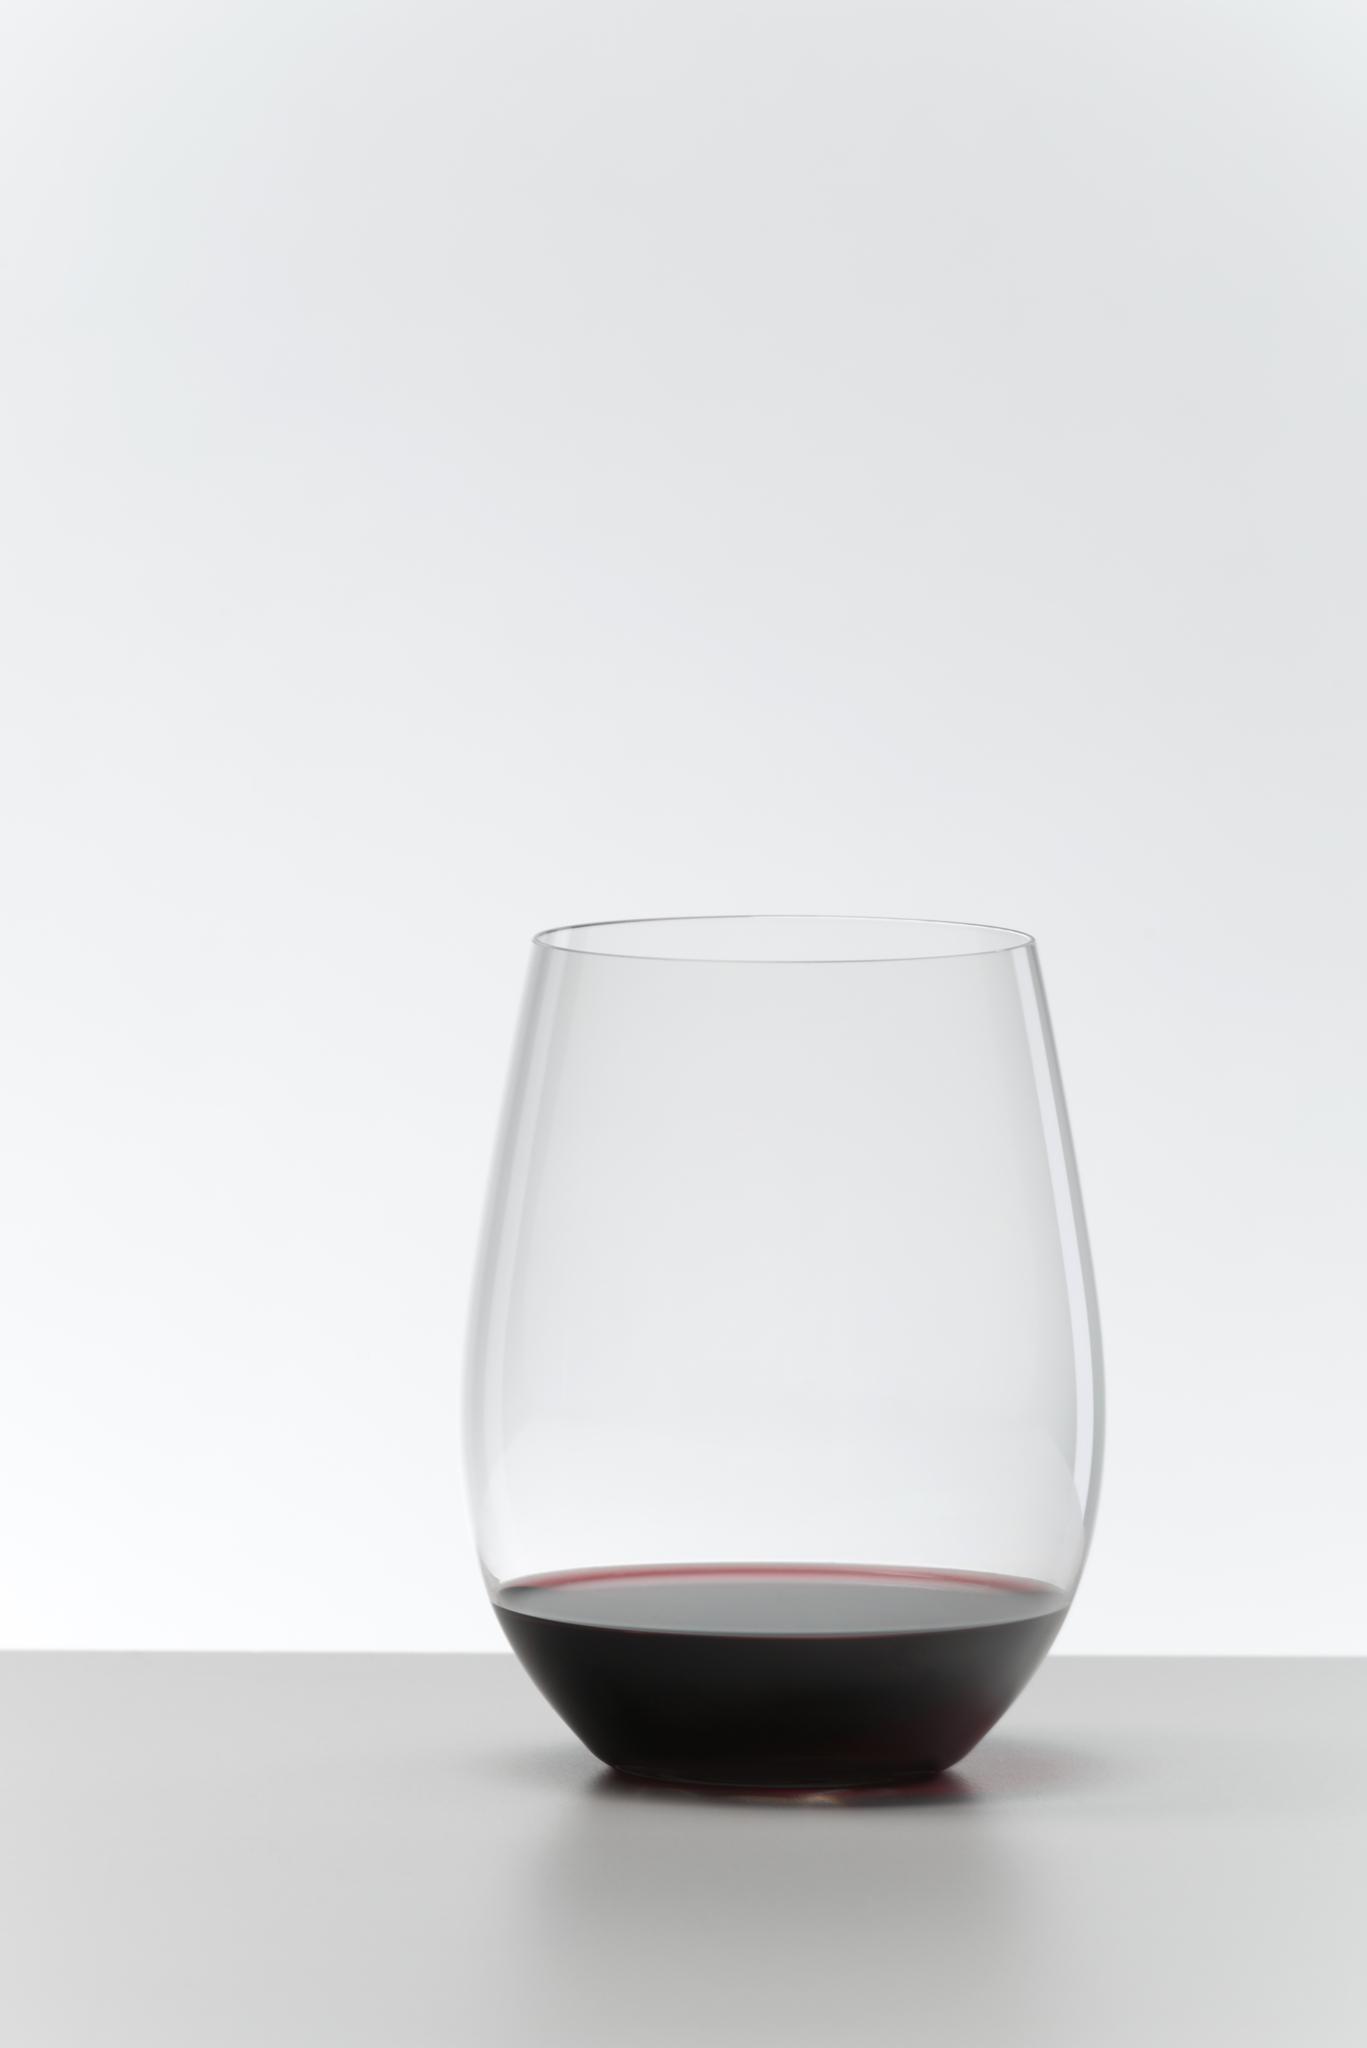 Бокалы Набор бокалов для красного вина 2шт 877мл Riedel The Big O Wine Tumbler Cabernet nabor-bokalov-dlya-krasnogo-vina-2-sht-877-ml-riedel-the-big-o-wine-tumbler-cabernet-avstriya.jpg